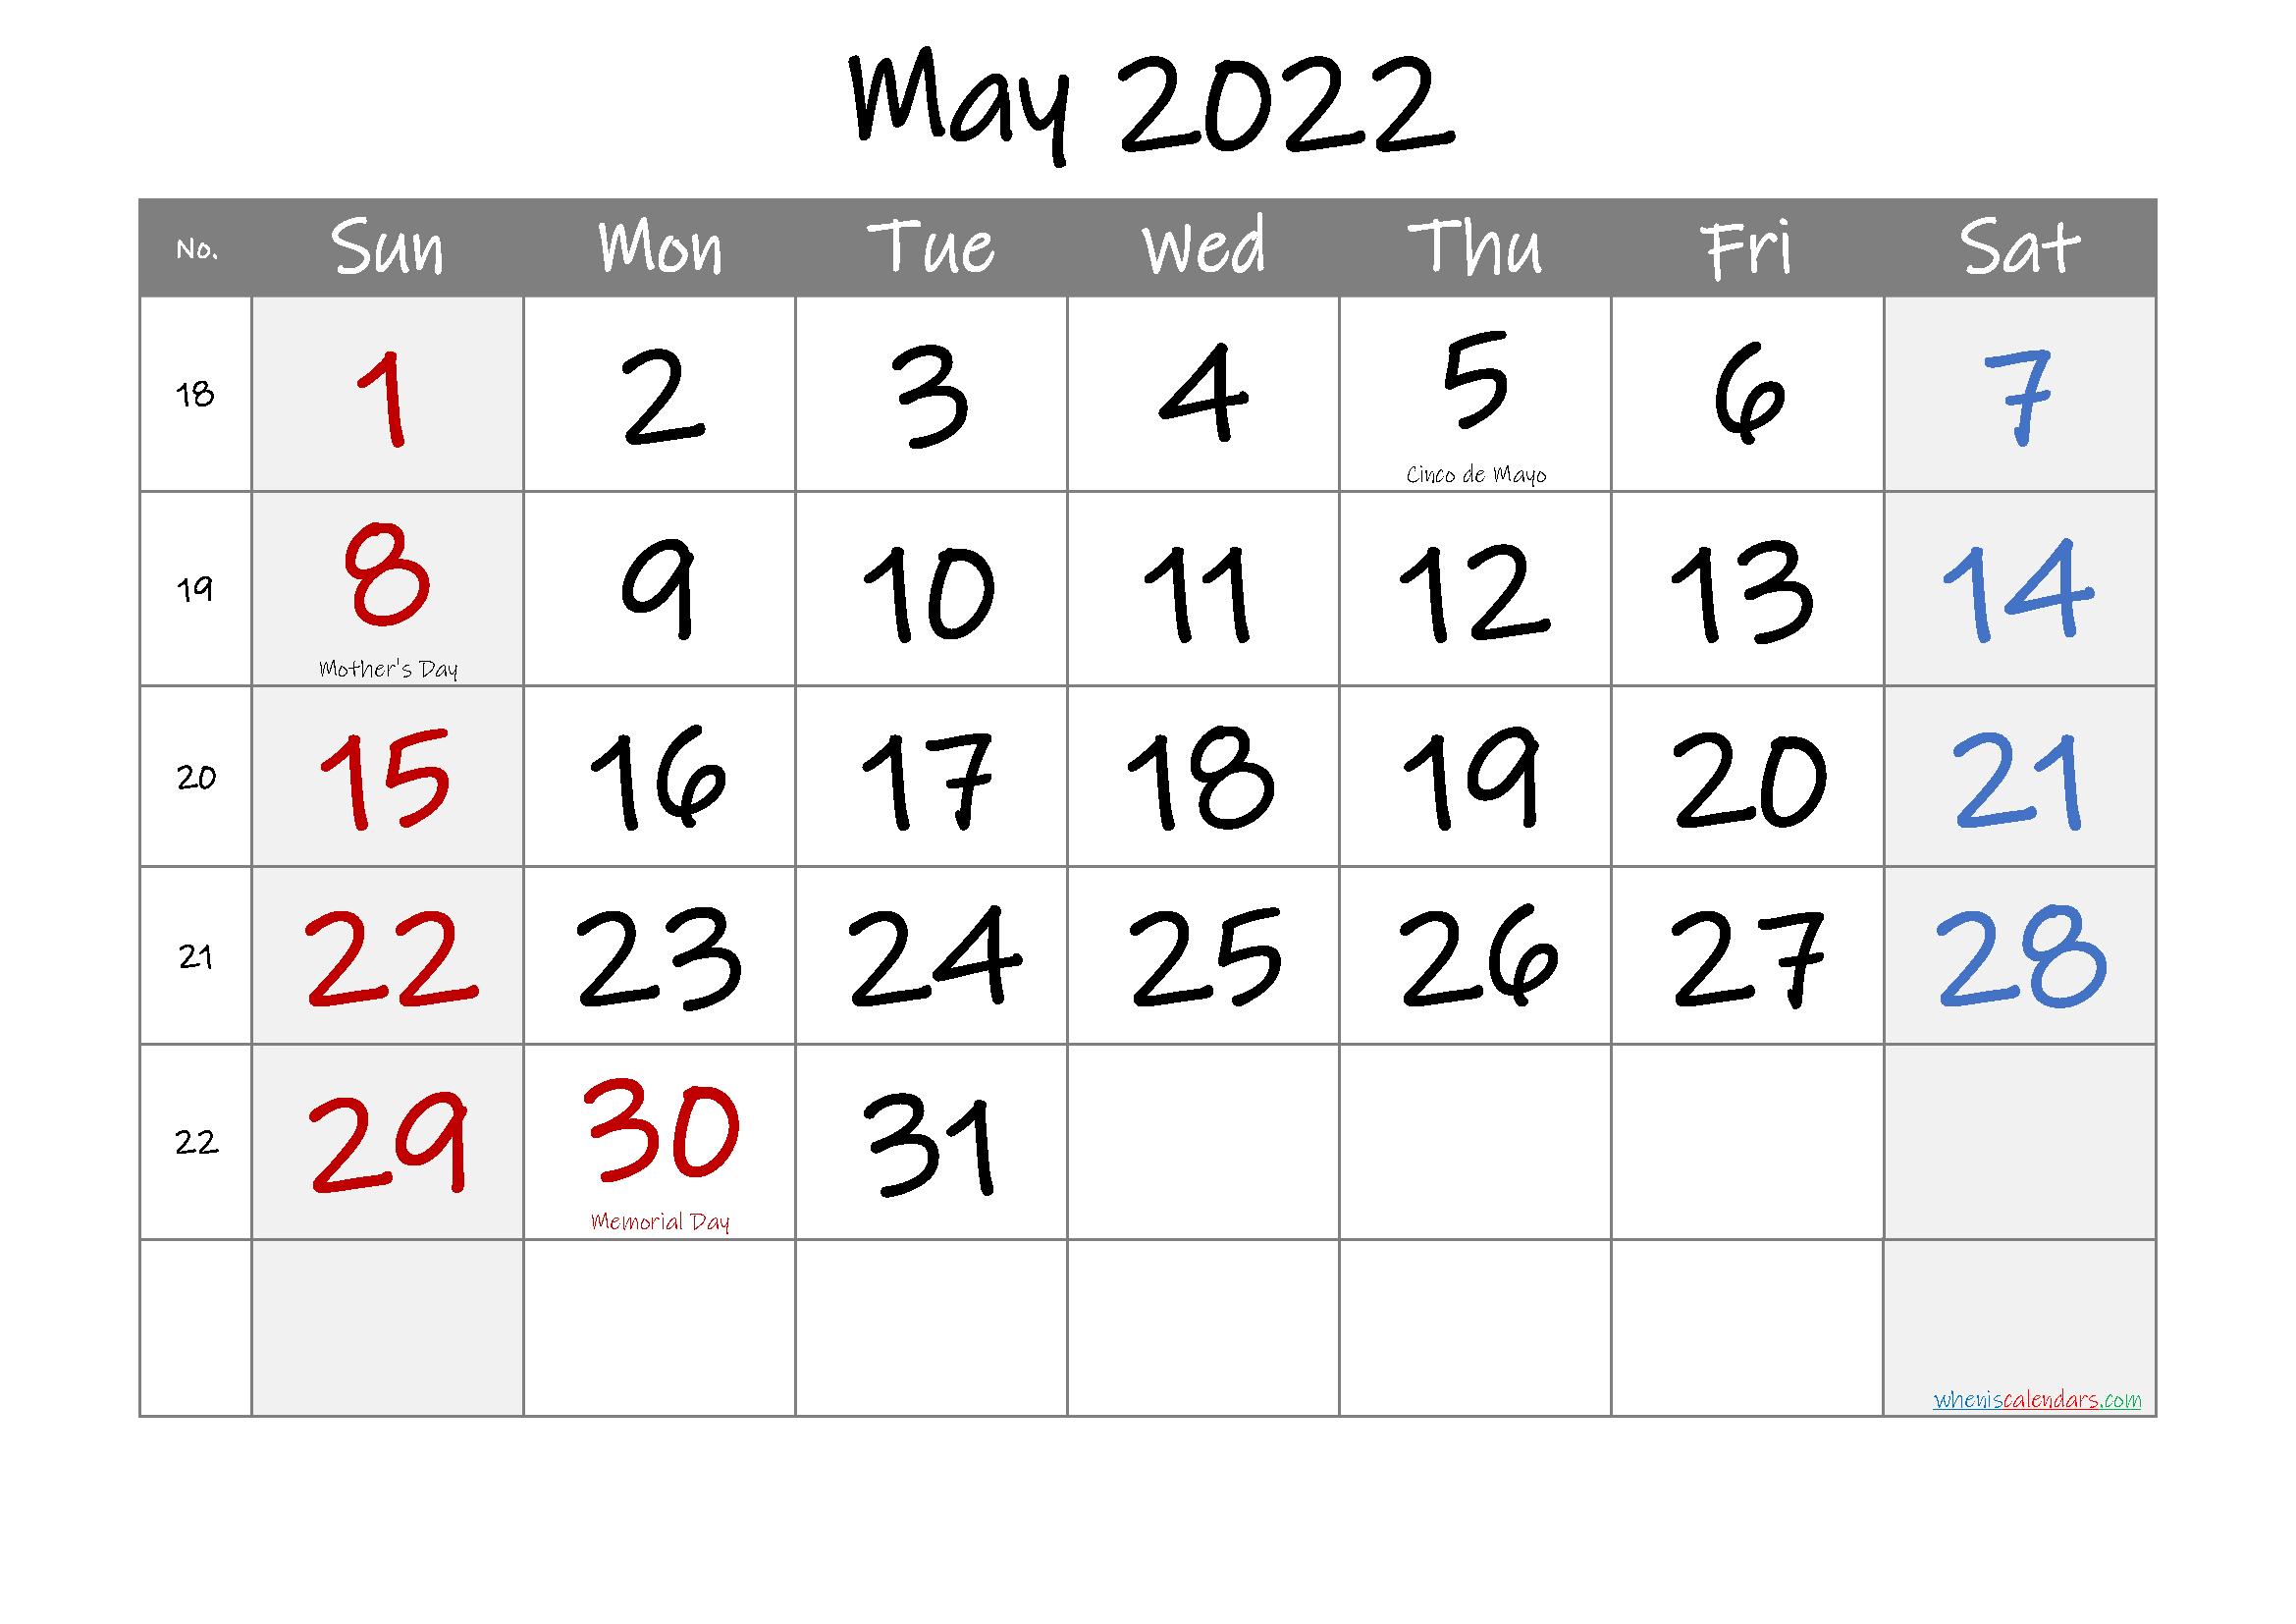 May 2022 Free Printable Calendar With Holidays-Template No regarding Free Printable 2022 Planner